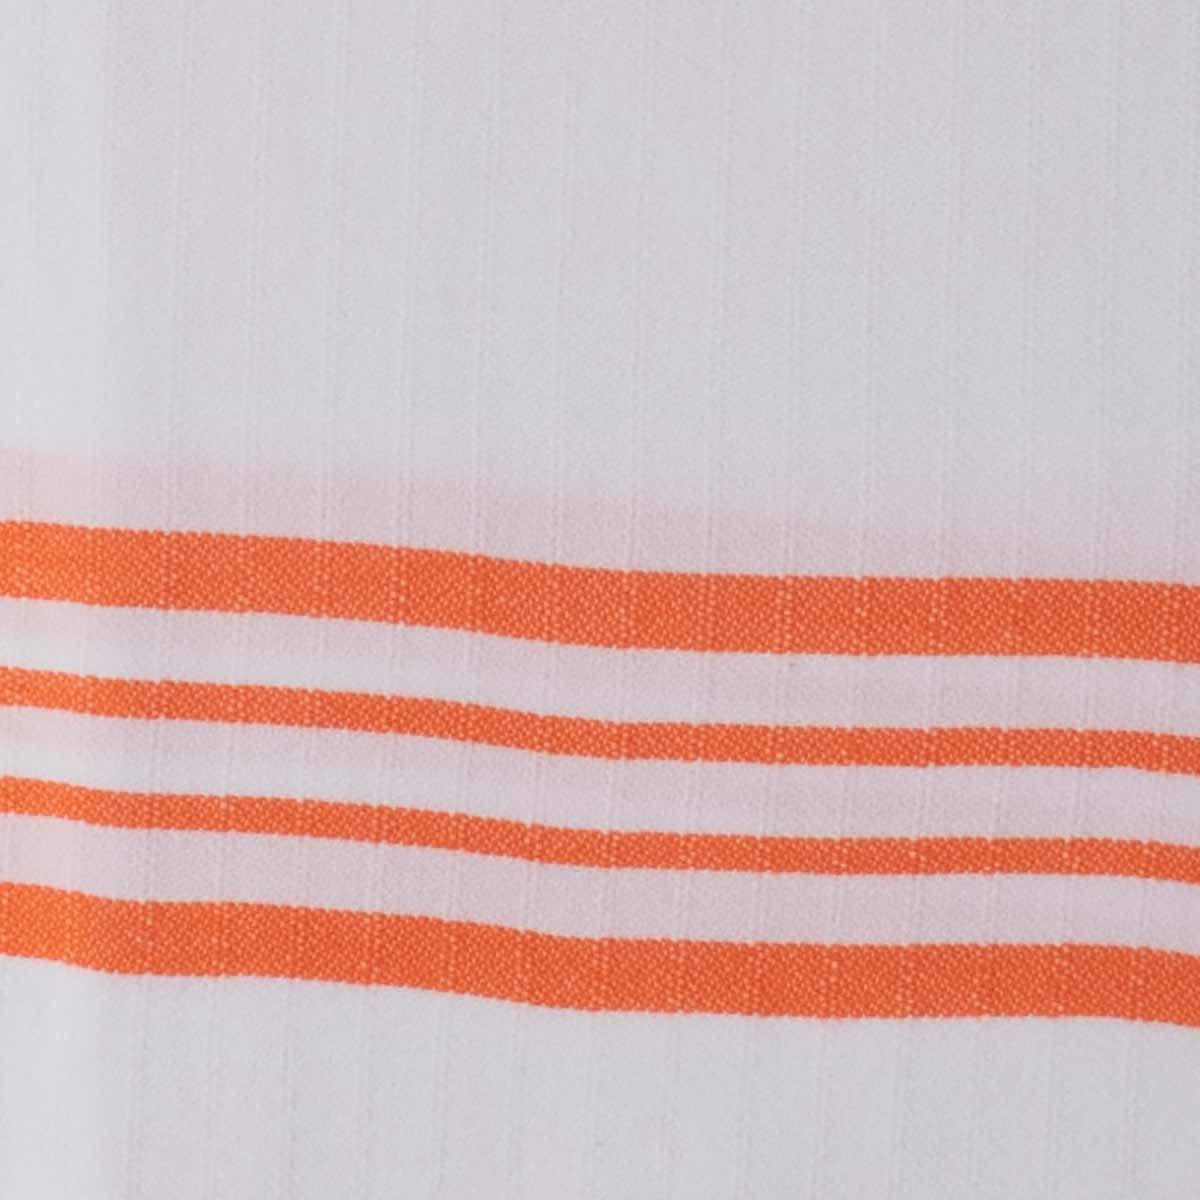 Peshkir - White Sultan / Orange Stripes